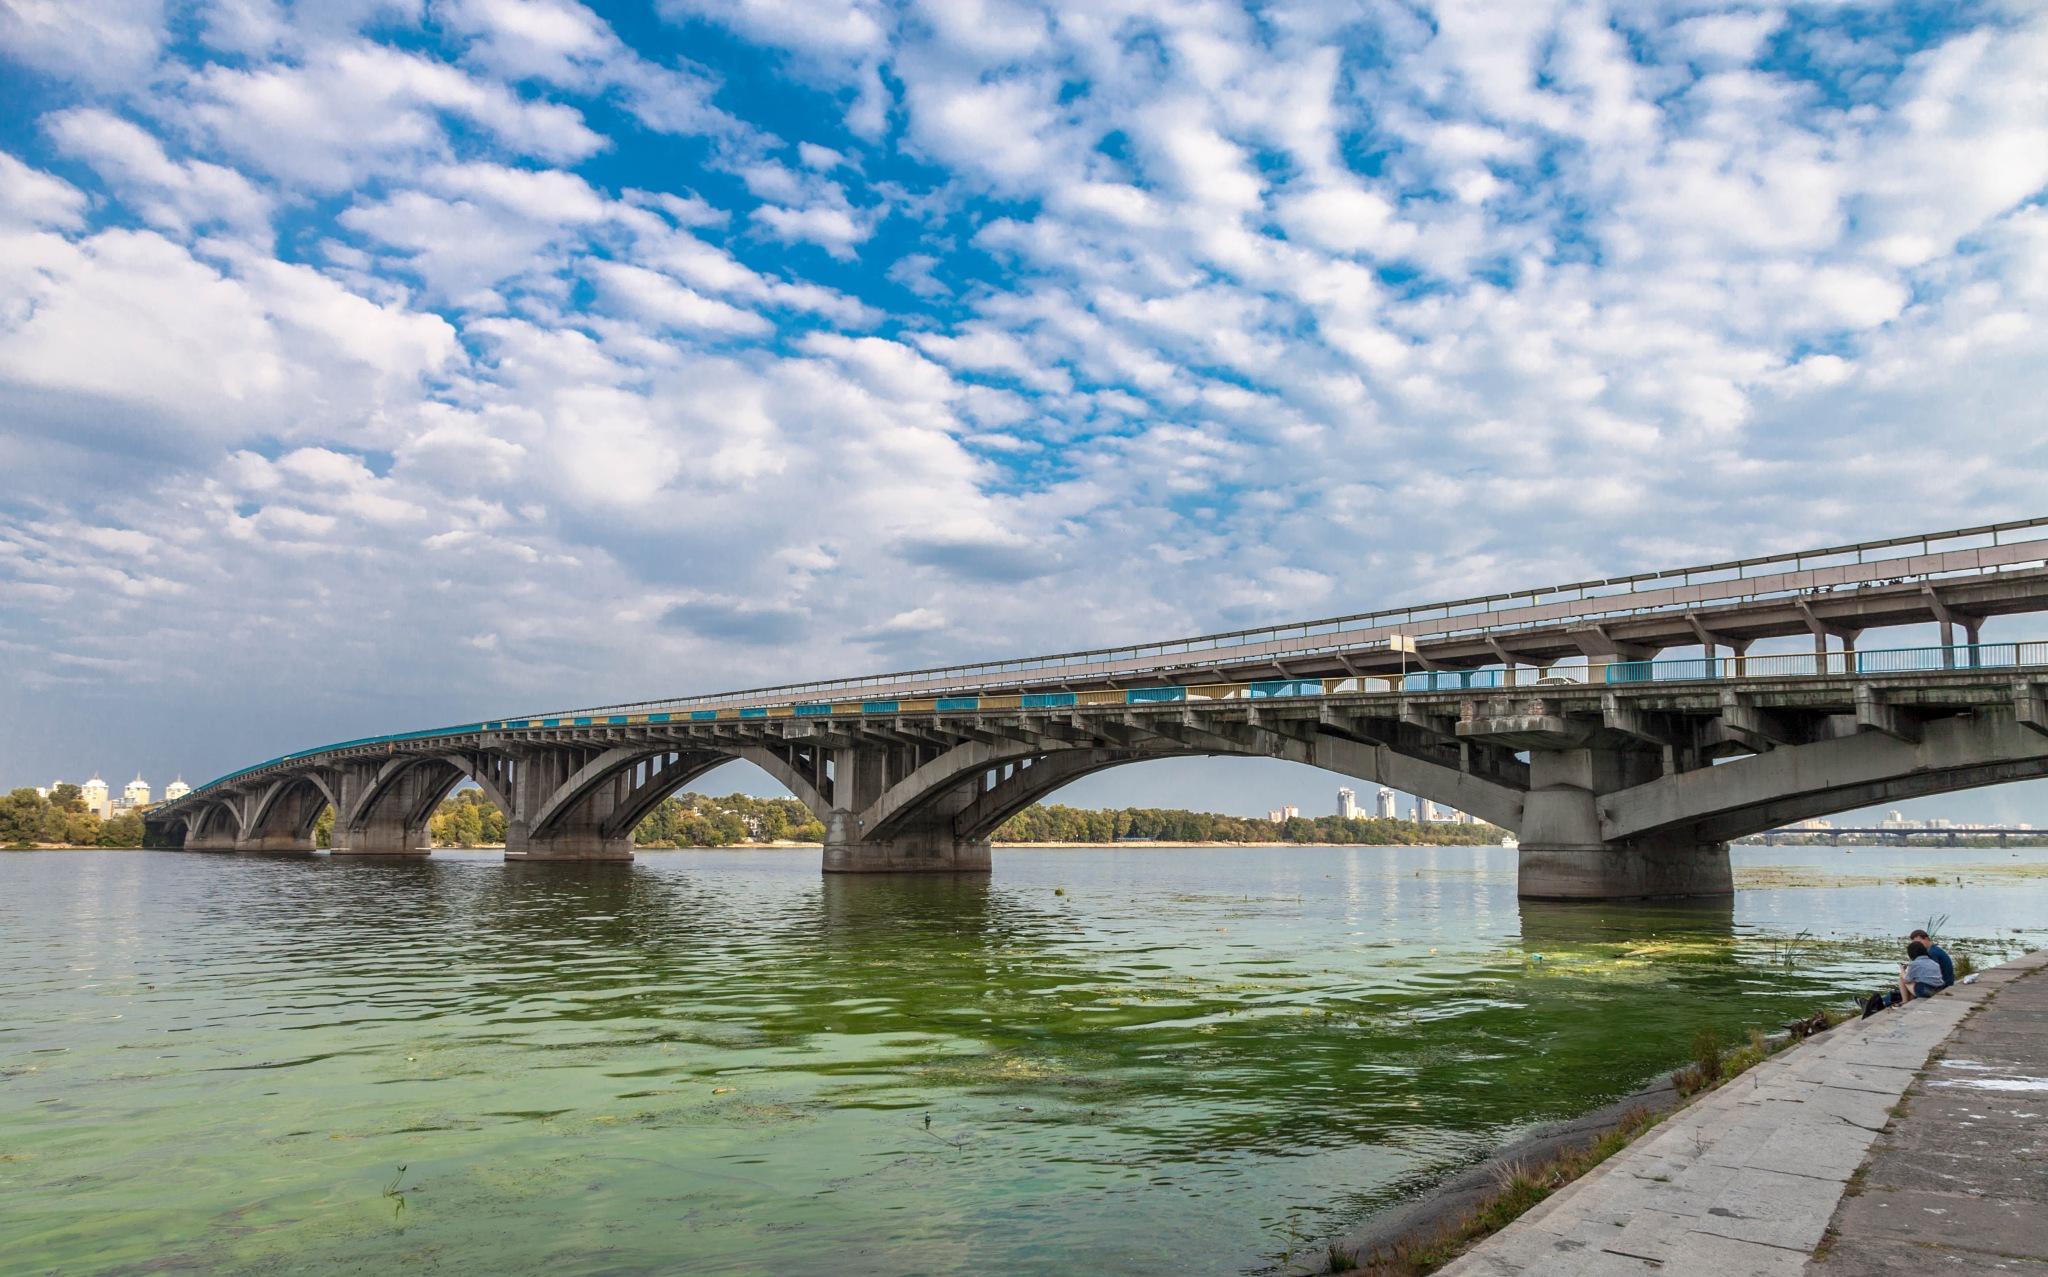 Love under bridge by Mikhail Minakov